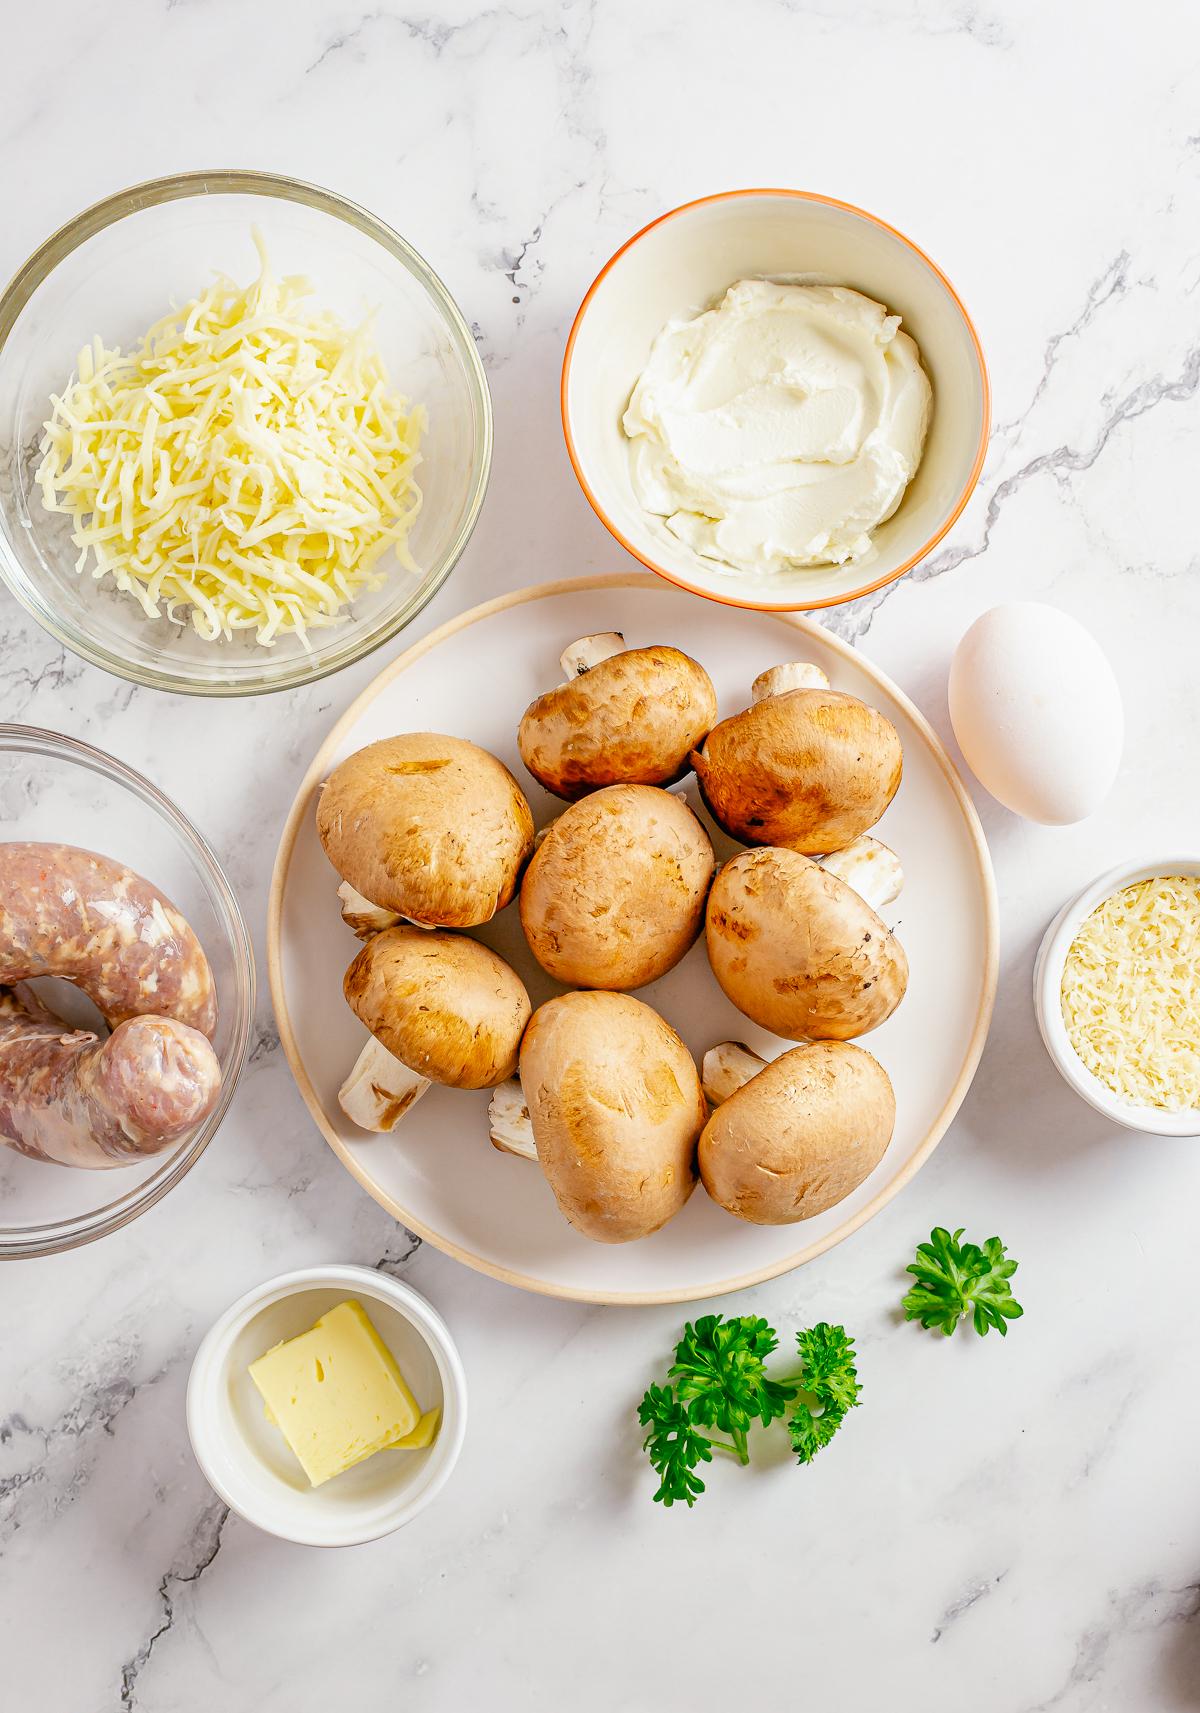 Ingredients needed to make Sausage Stuffed Mushrooms.